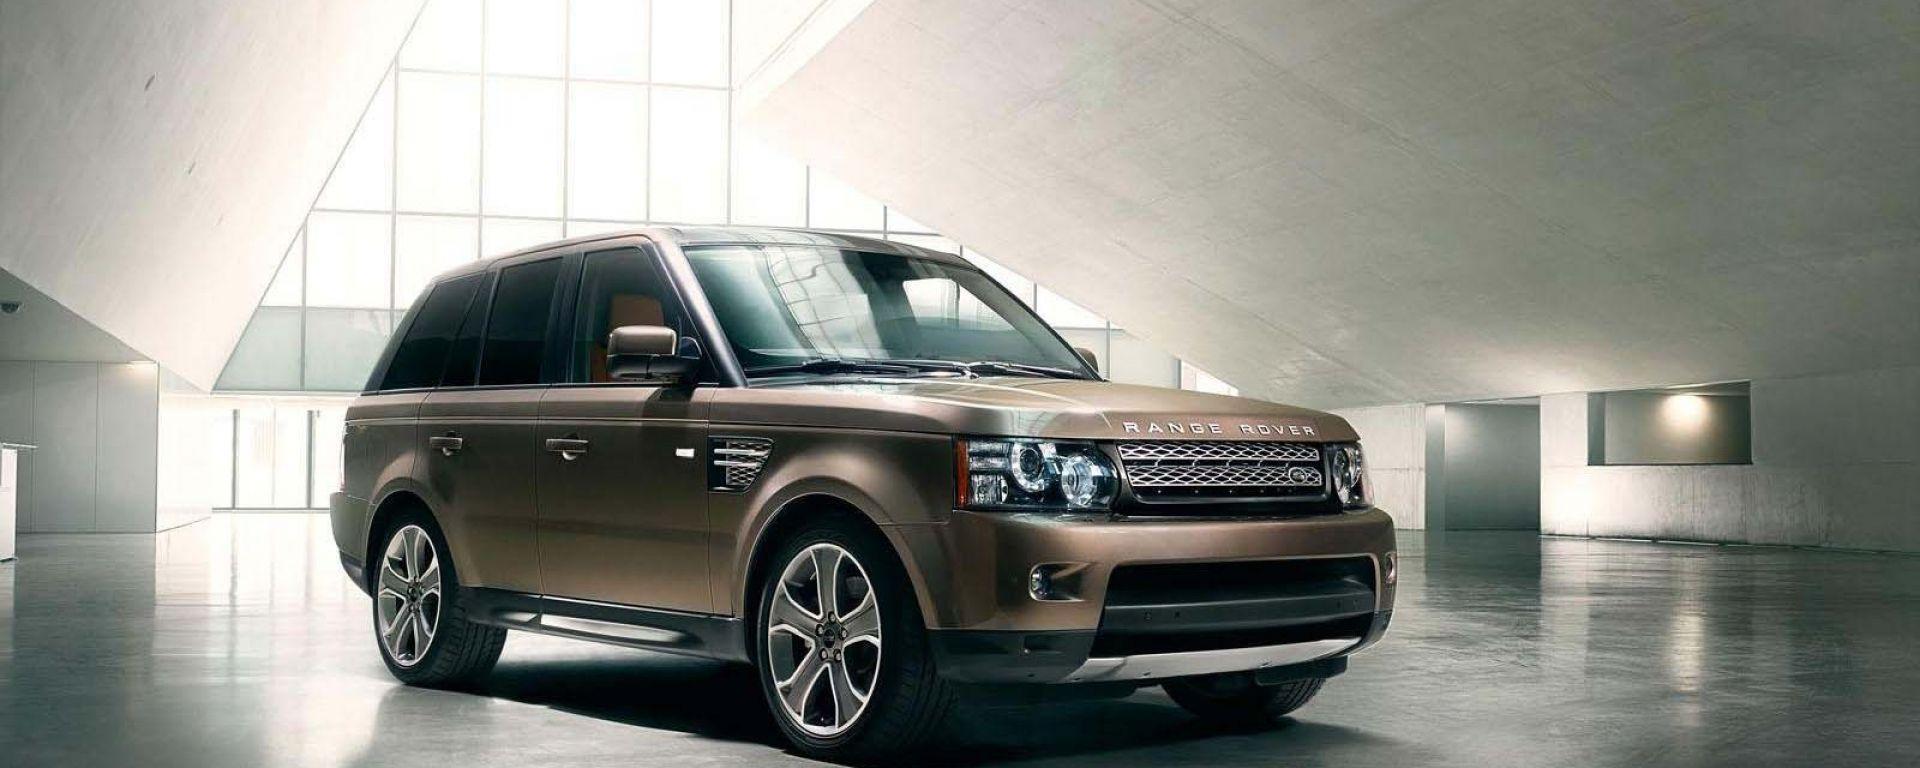 Range Rover Sport MY 2013